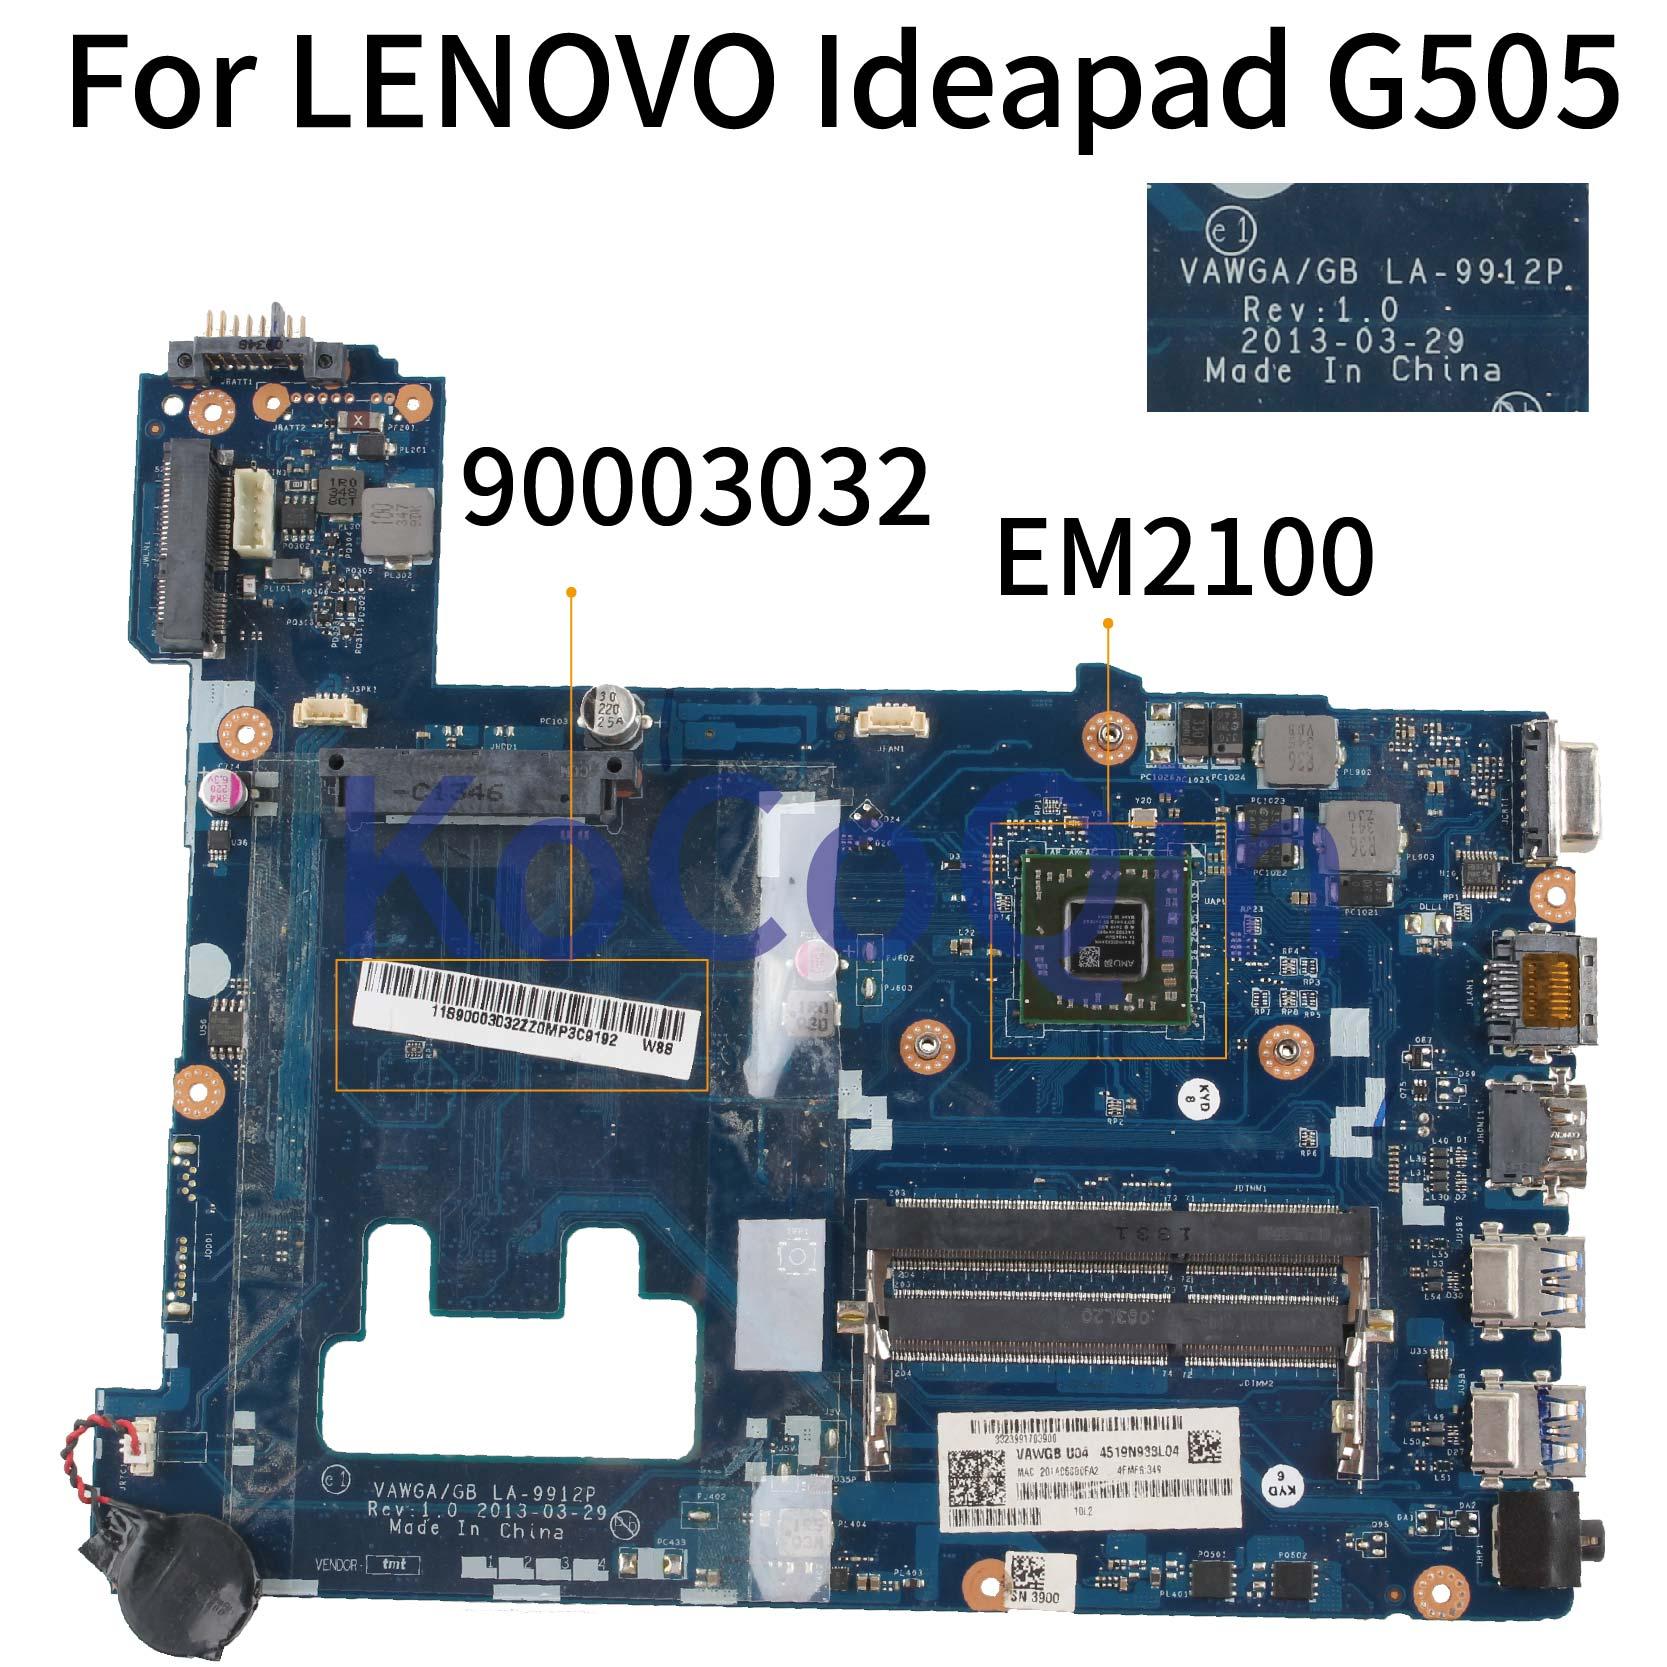 VAWGA/GB LA-9912P لينوفو Ideapad G505 EM2100 15 بوصة الكمبيوتر المحمول اللوحة الرئيسية VAWGA/GB LA-9912P اللوحة الأم 90003032